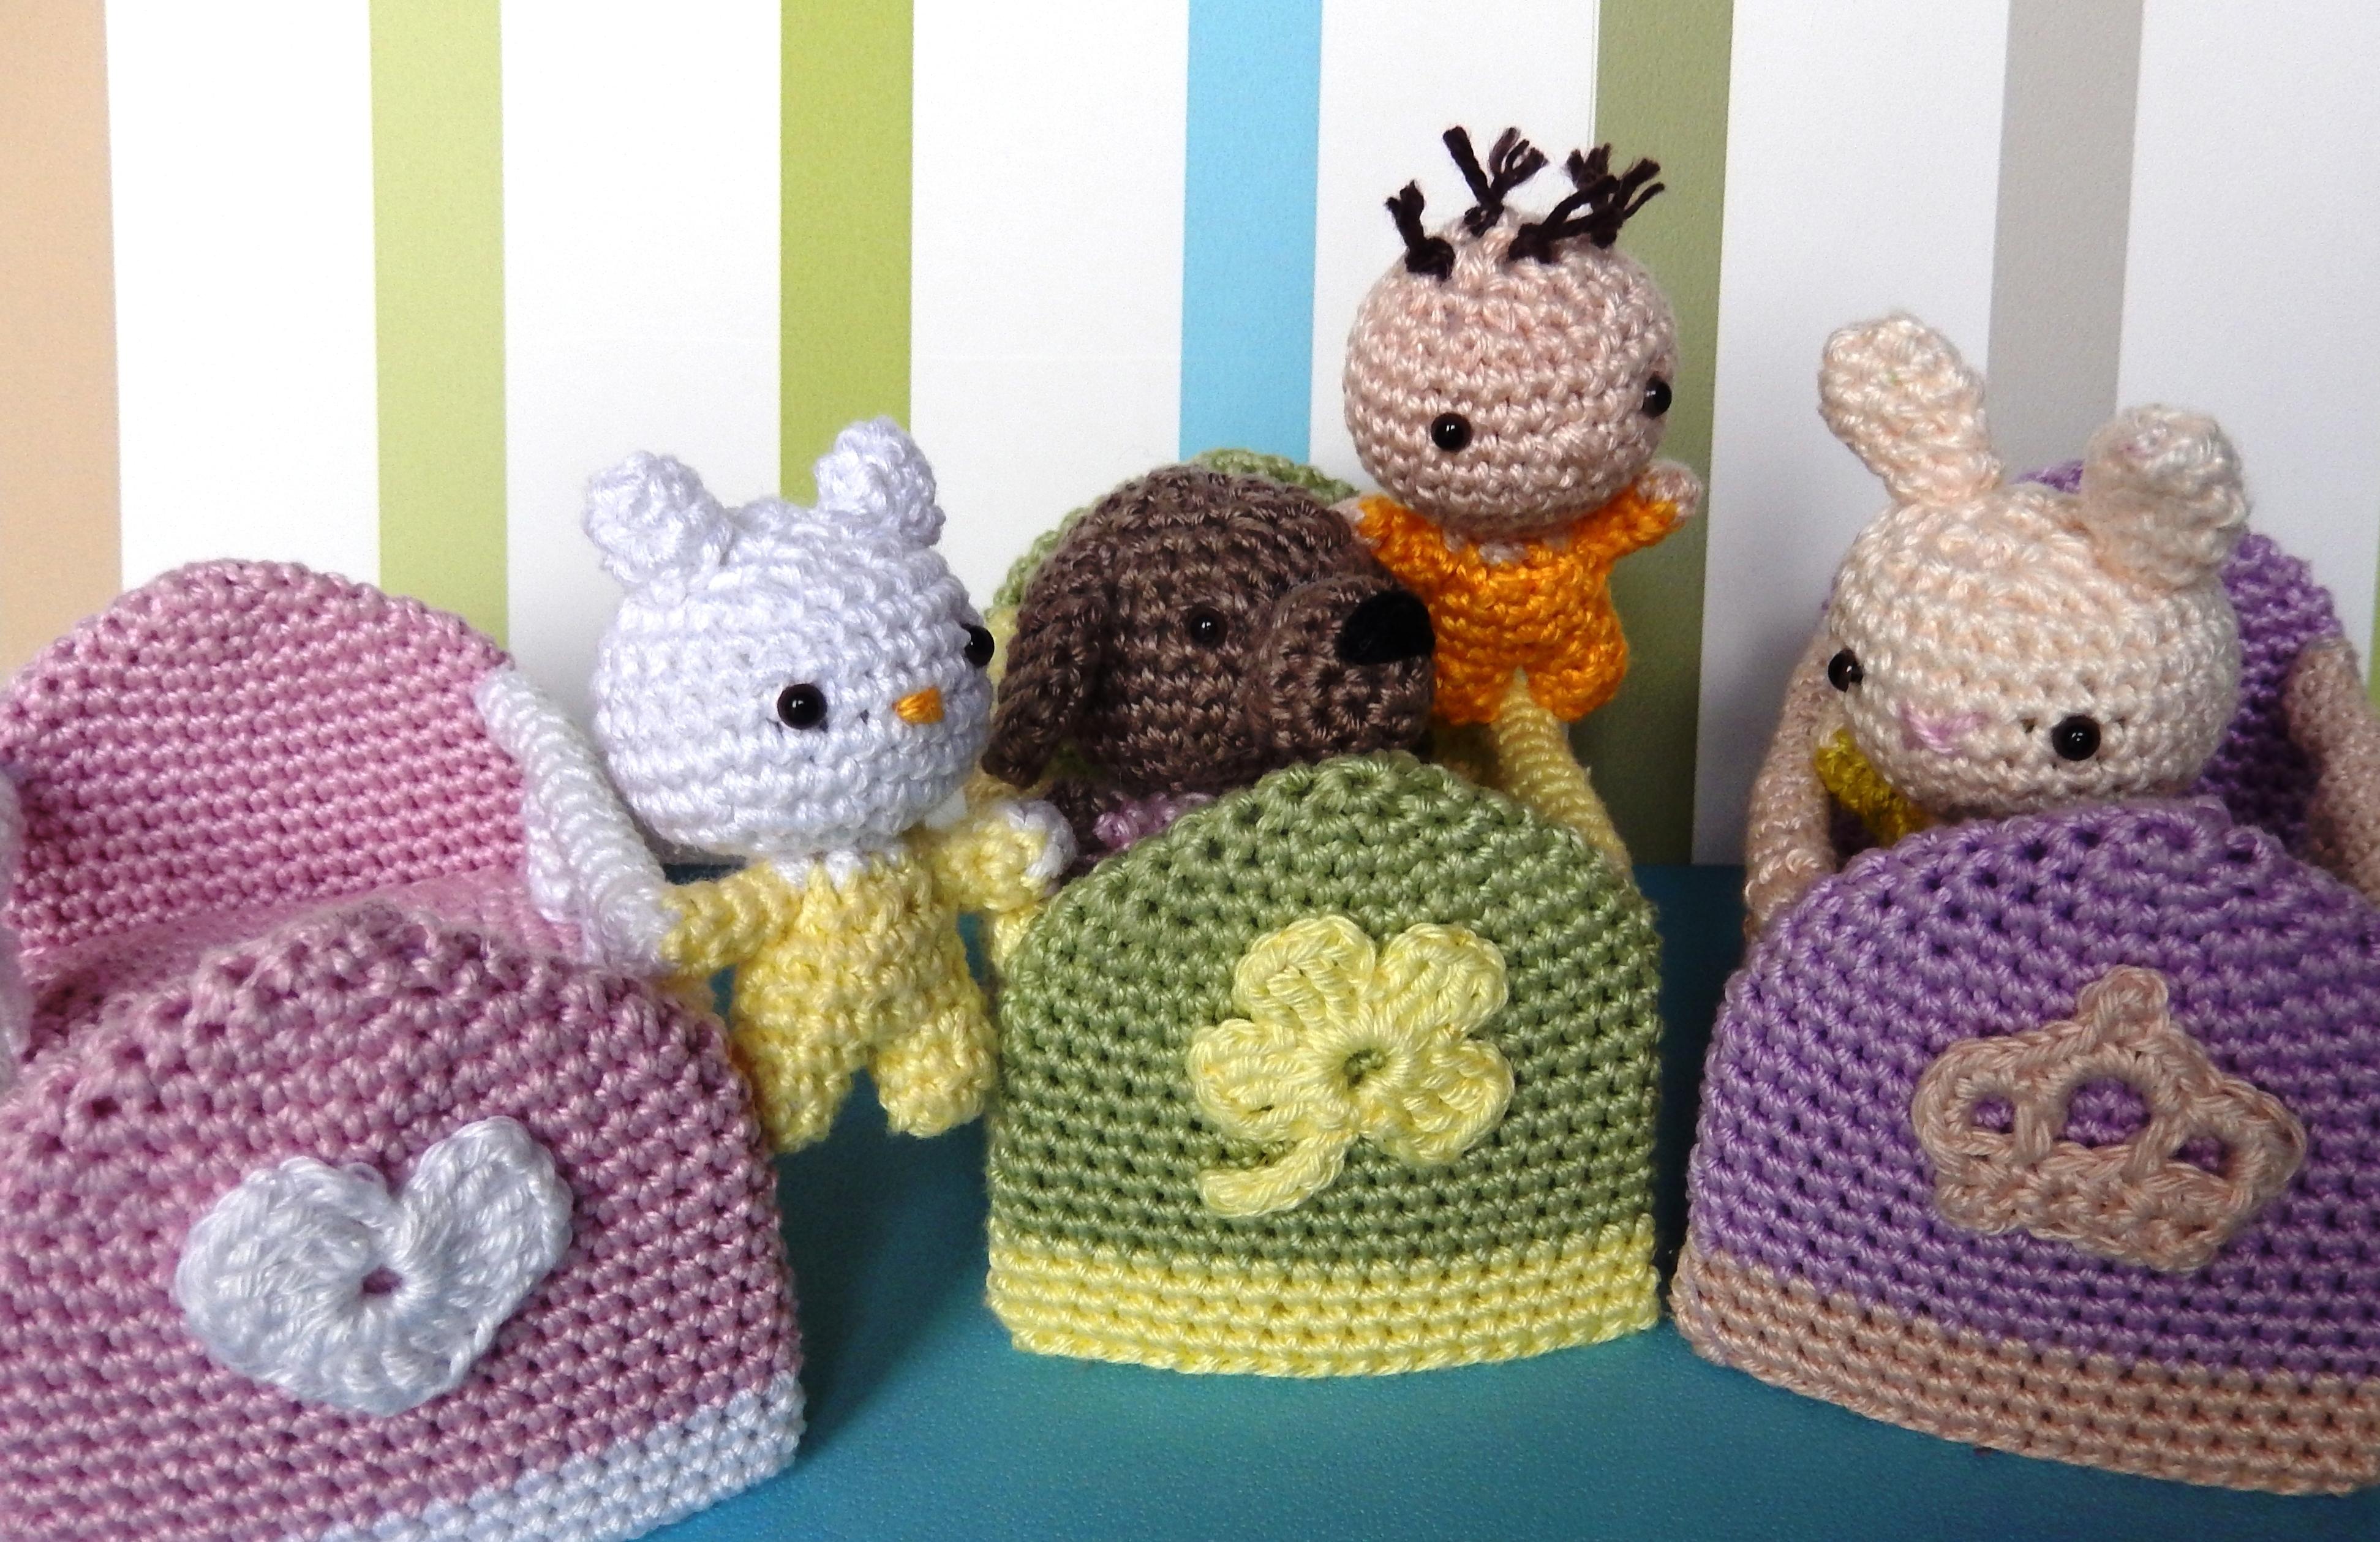 Crochet Pattern The Nursery Baby Furniture Rocking Horse Crib   Etsy   2518x3886